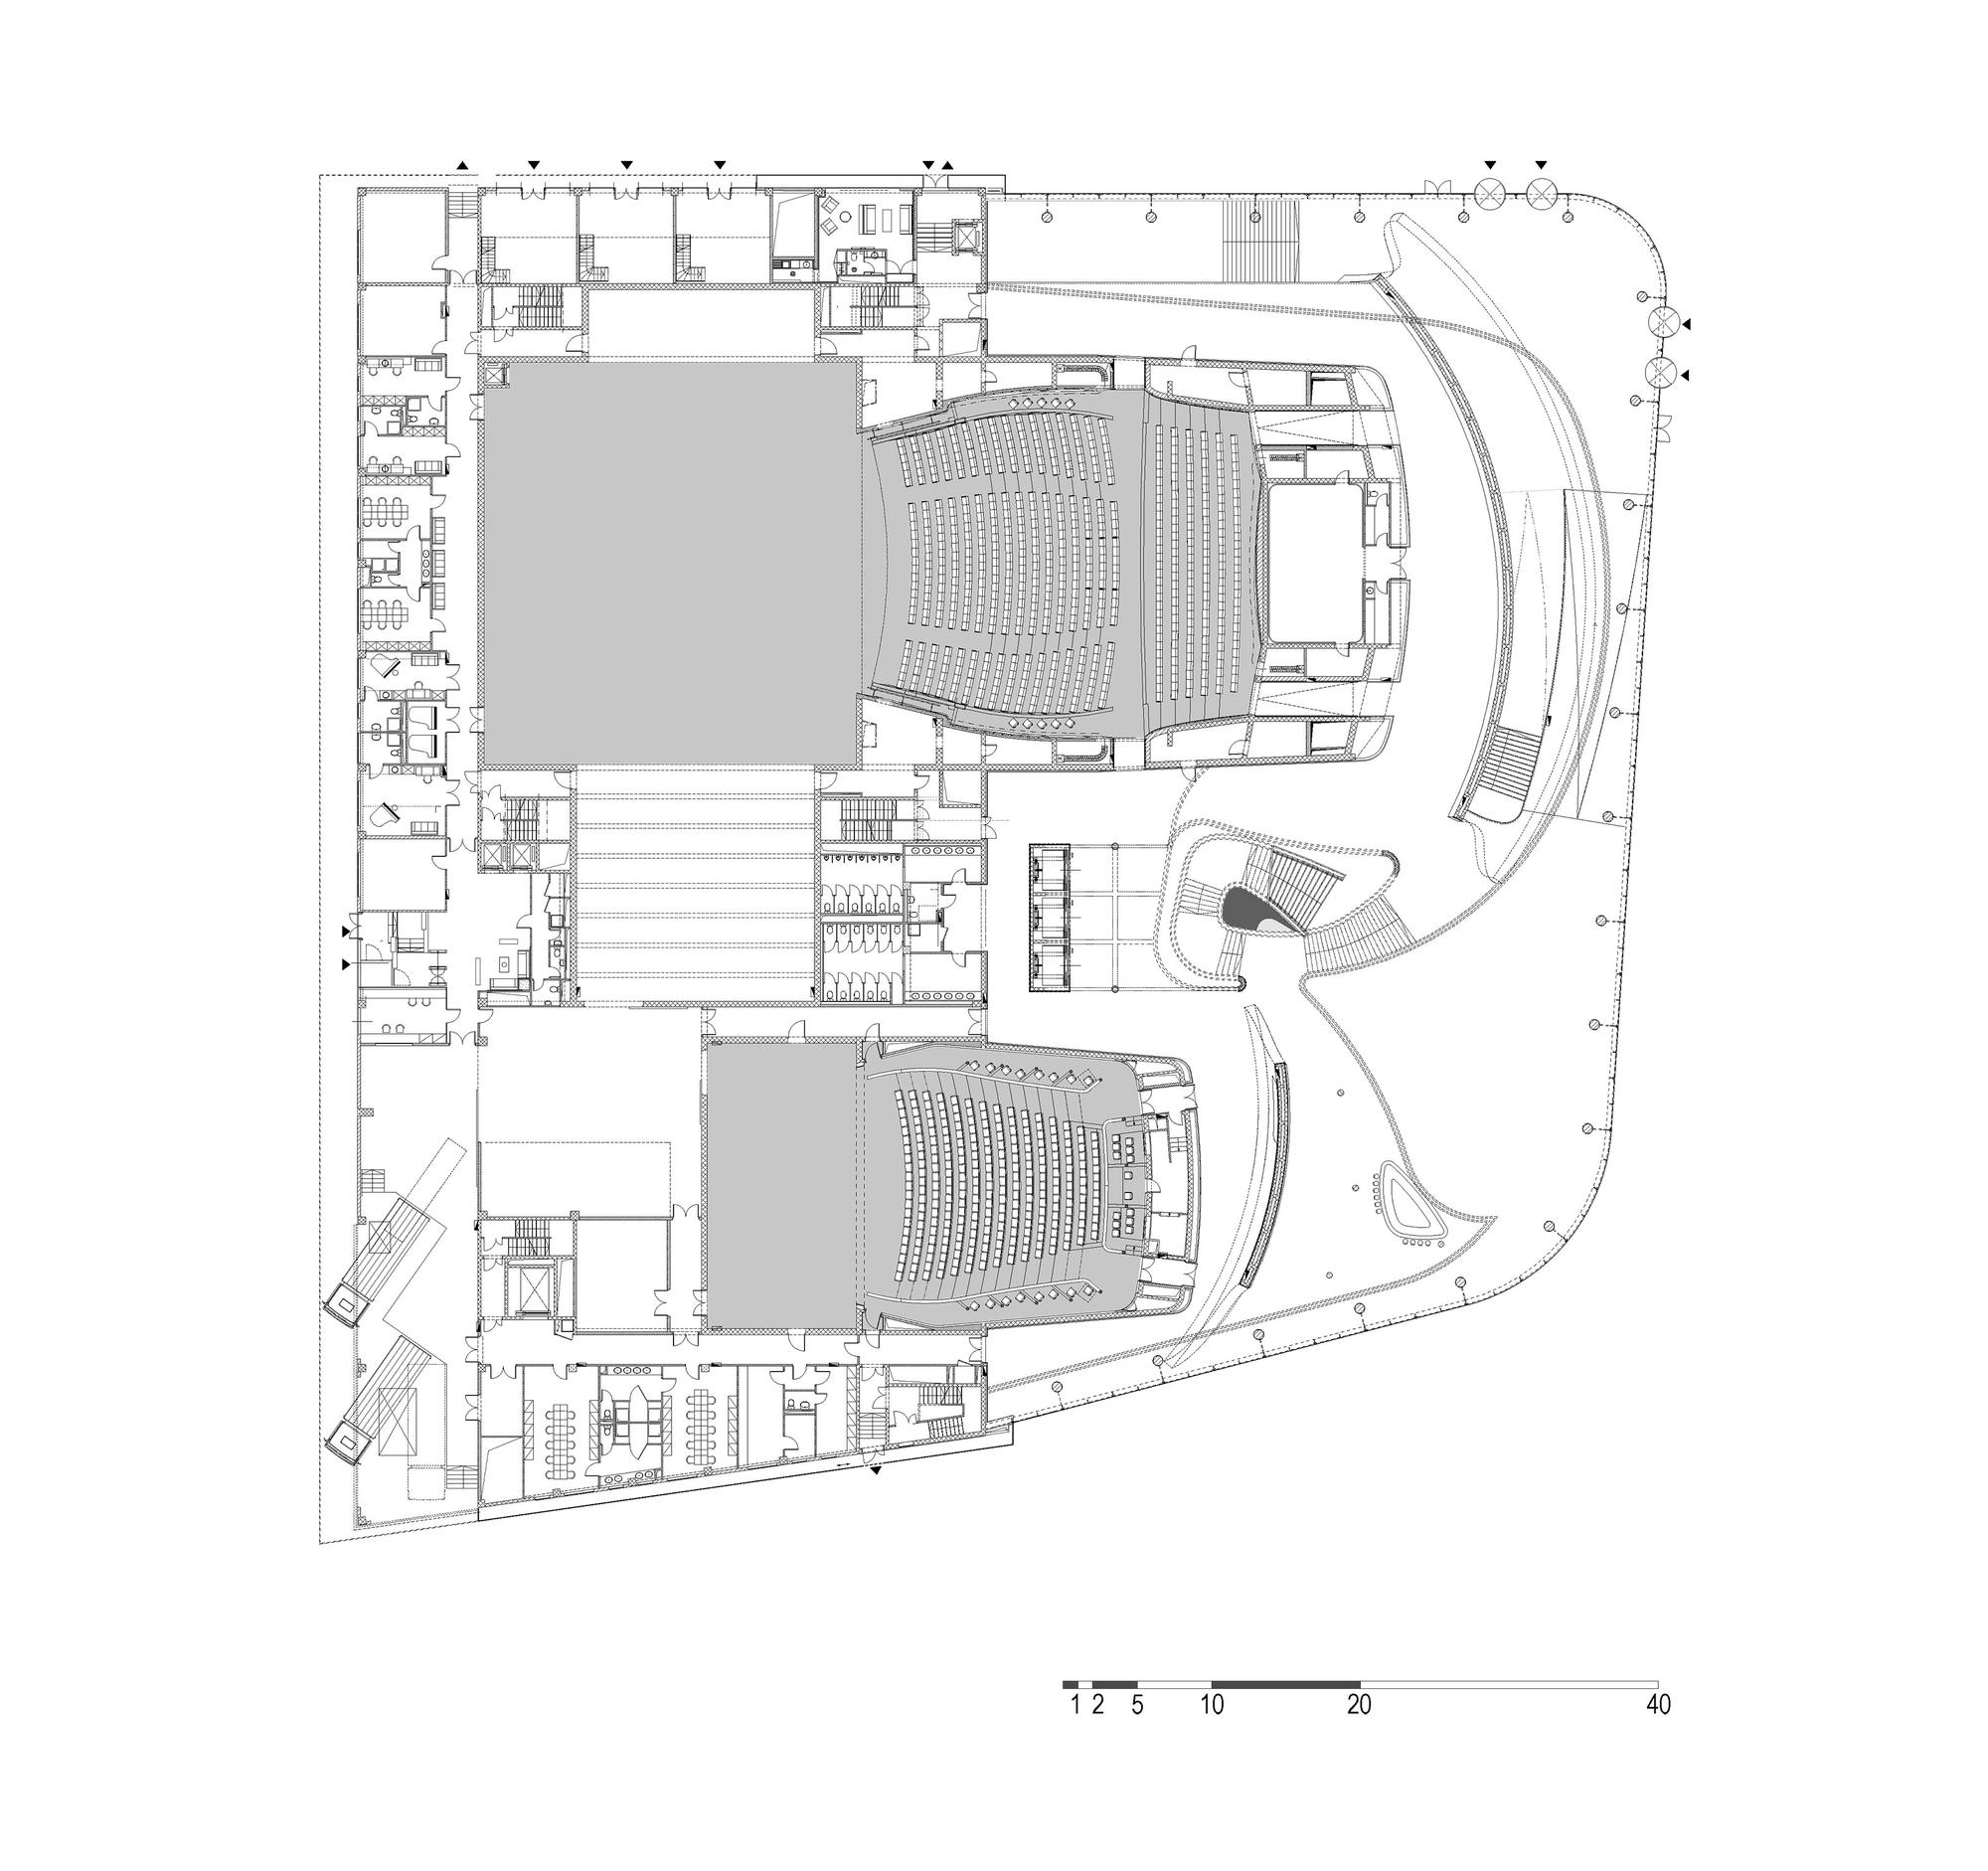 http://ad009cdnb.archdaily.net/wp-content/uploads/2014/11/545d8c6de58ece1aae0000e3_shenzhen-performing-arts-facility-zoboki-demeter-associates-_nanshan_general_floor.png